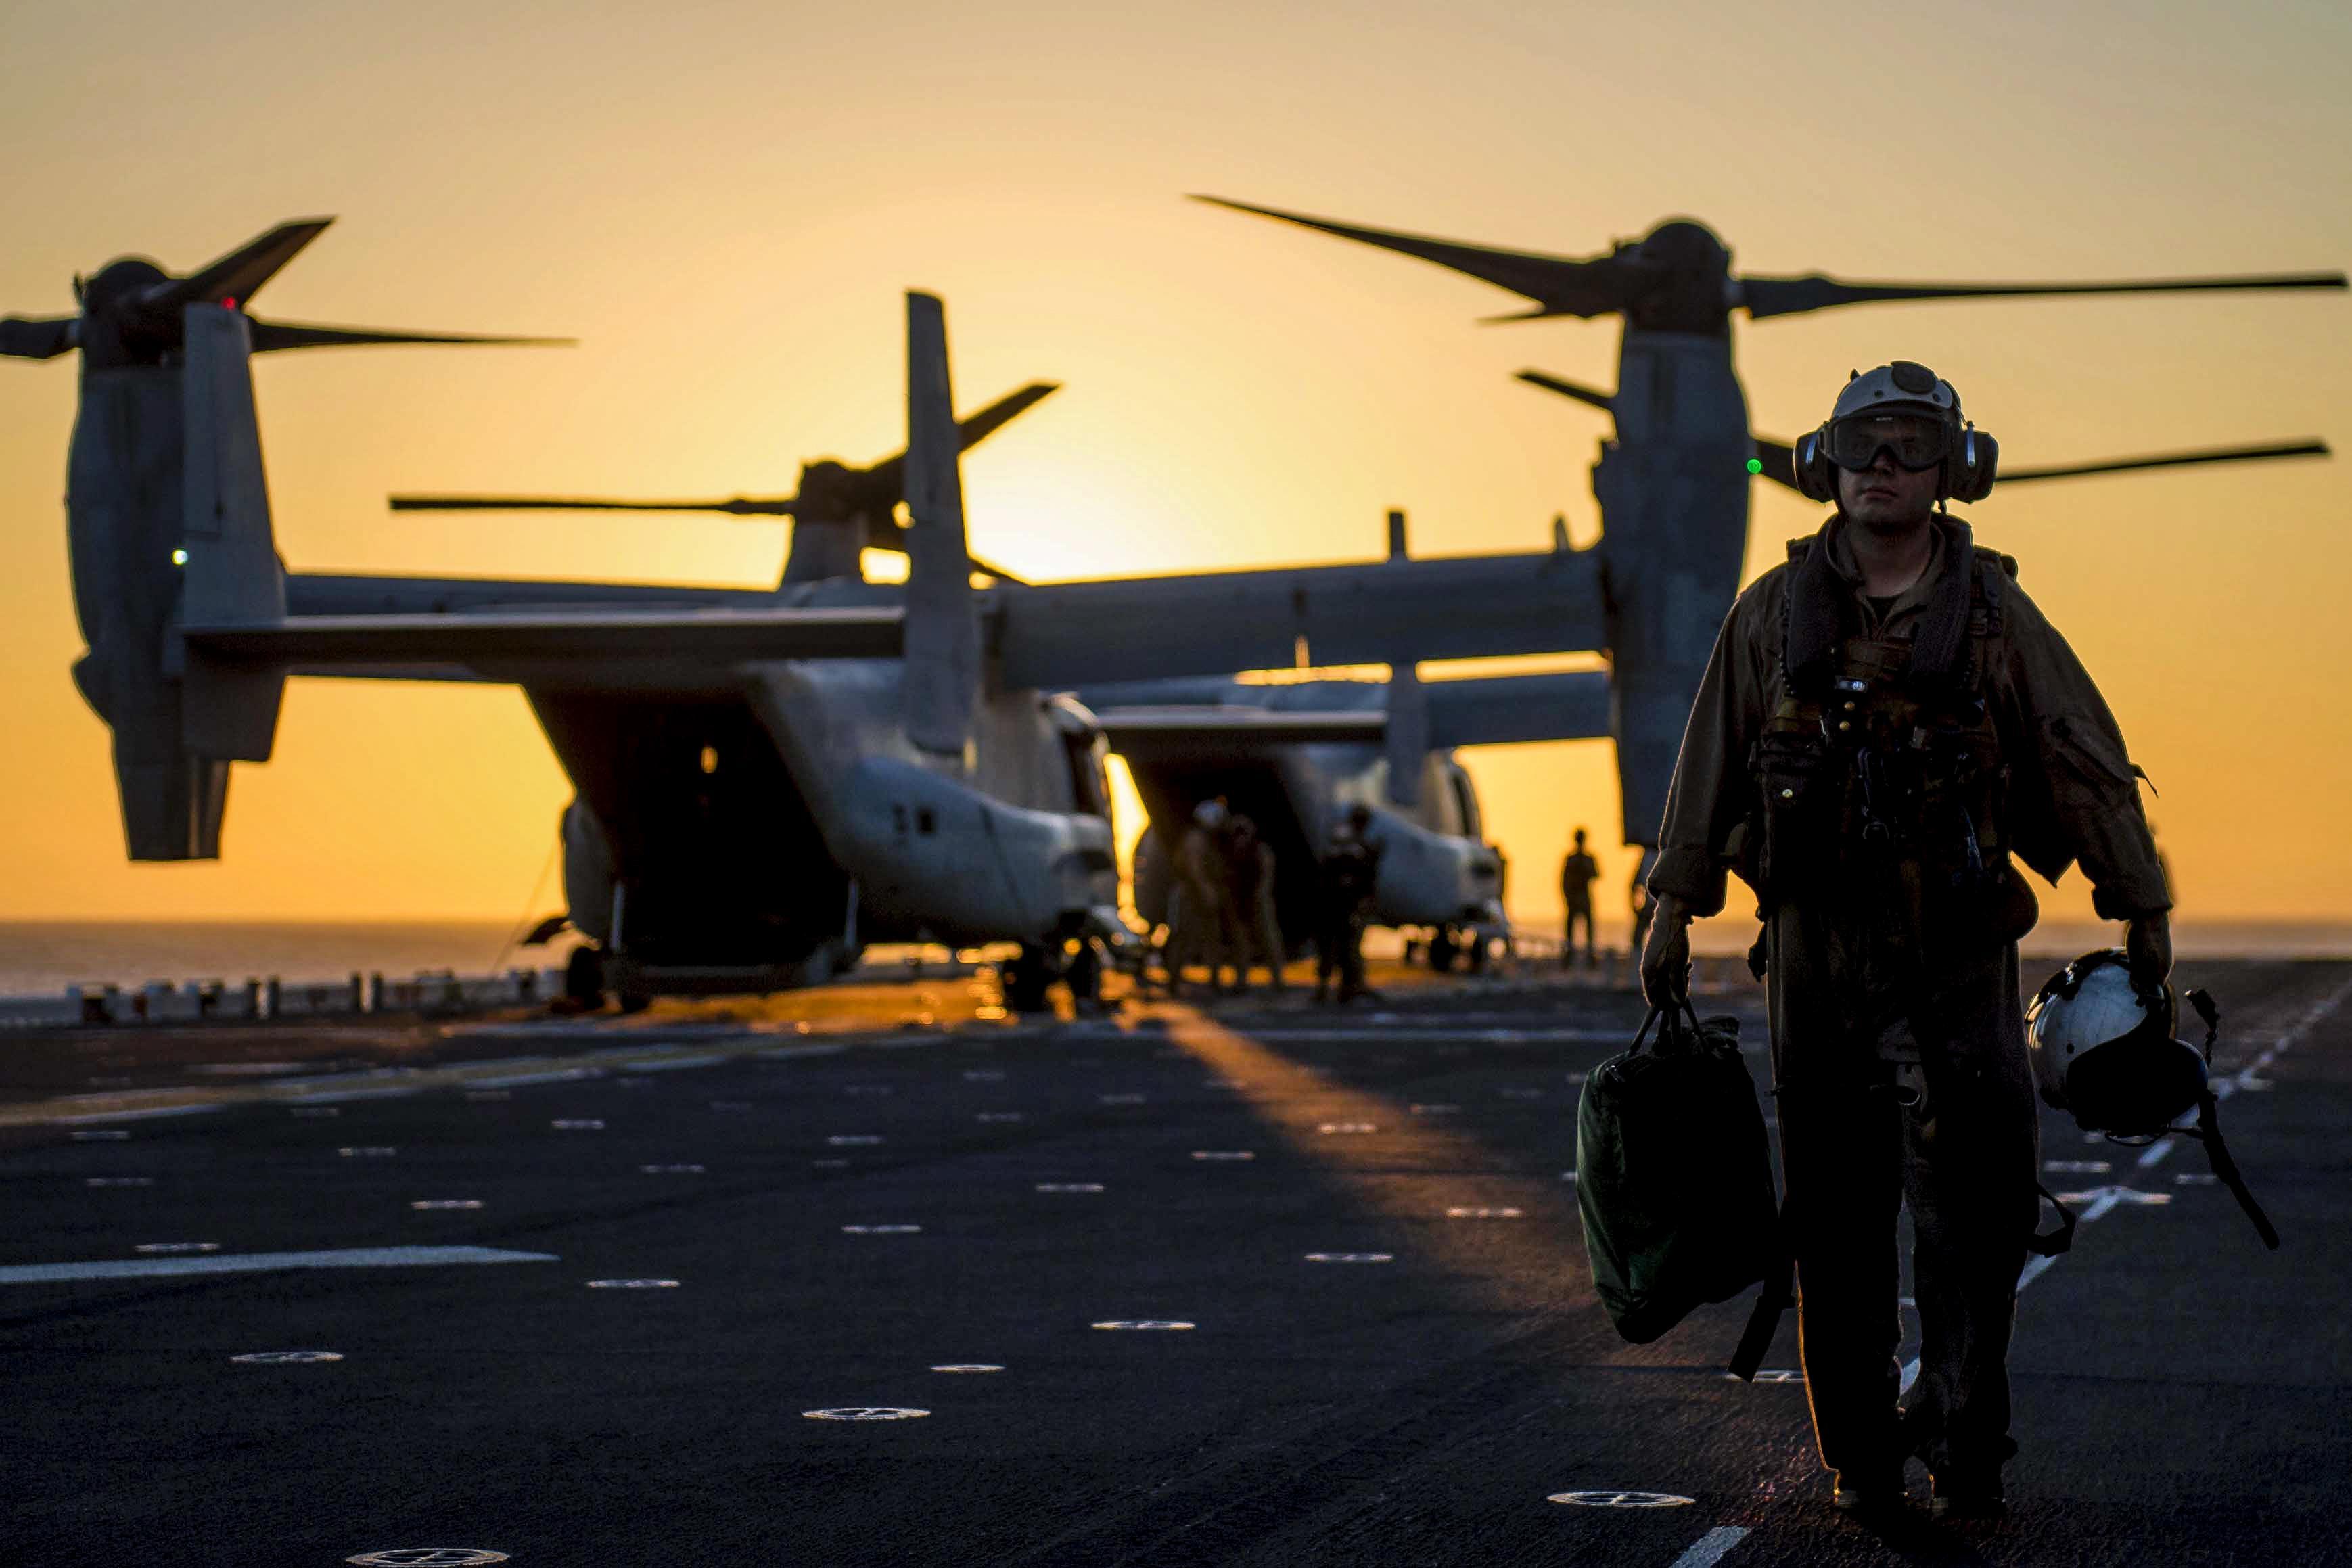 U.S. Navy photo by Seaman Clark Lane/defense.gov